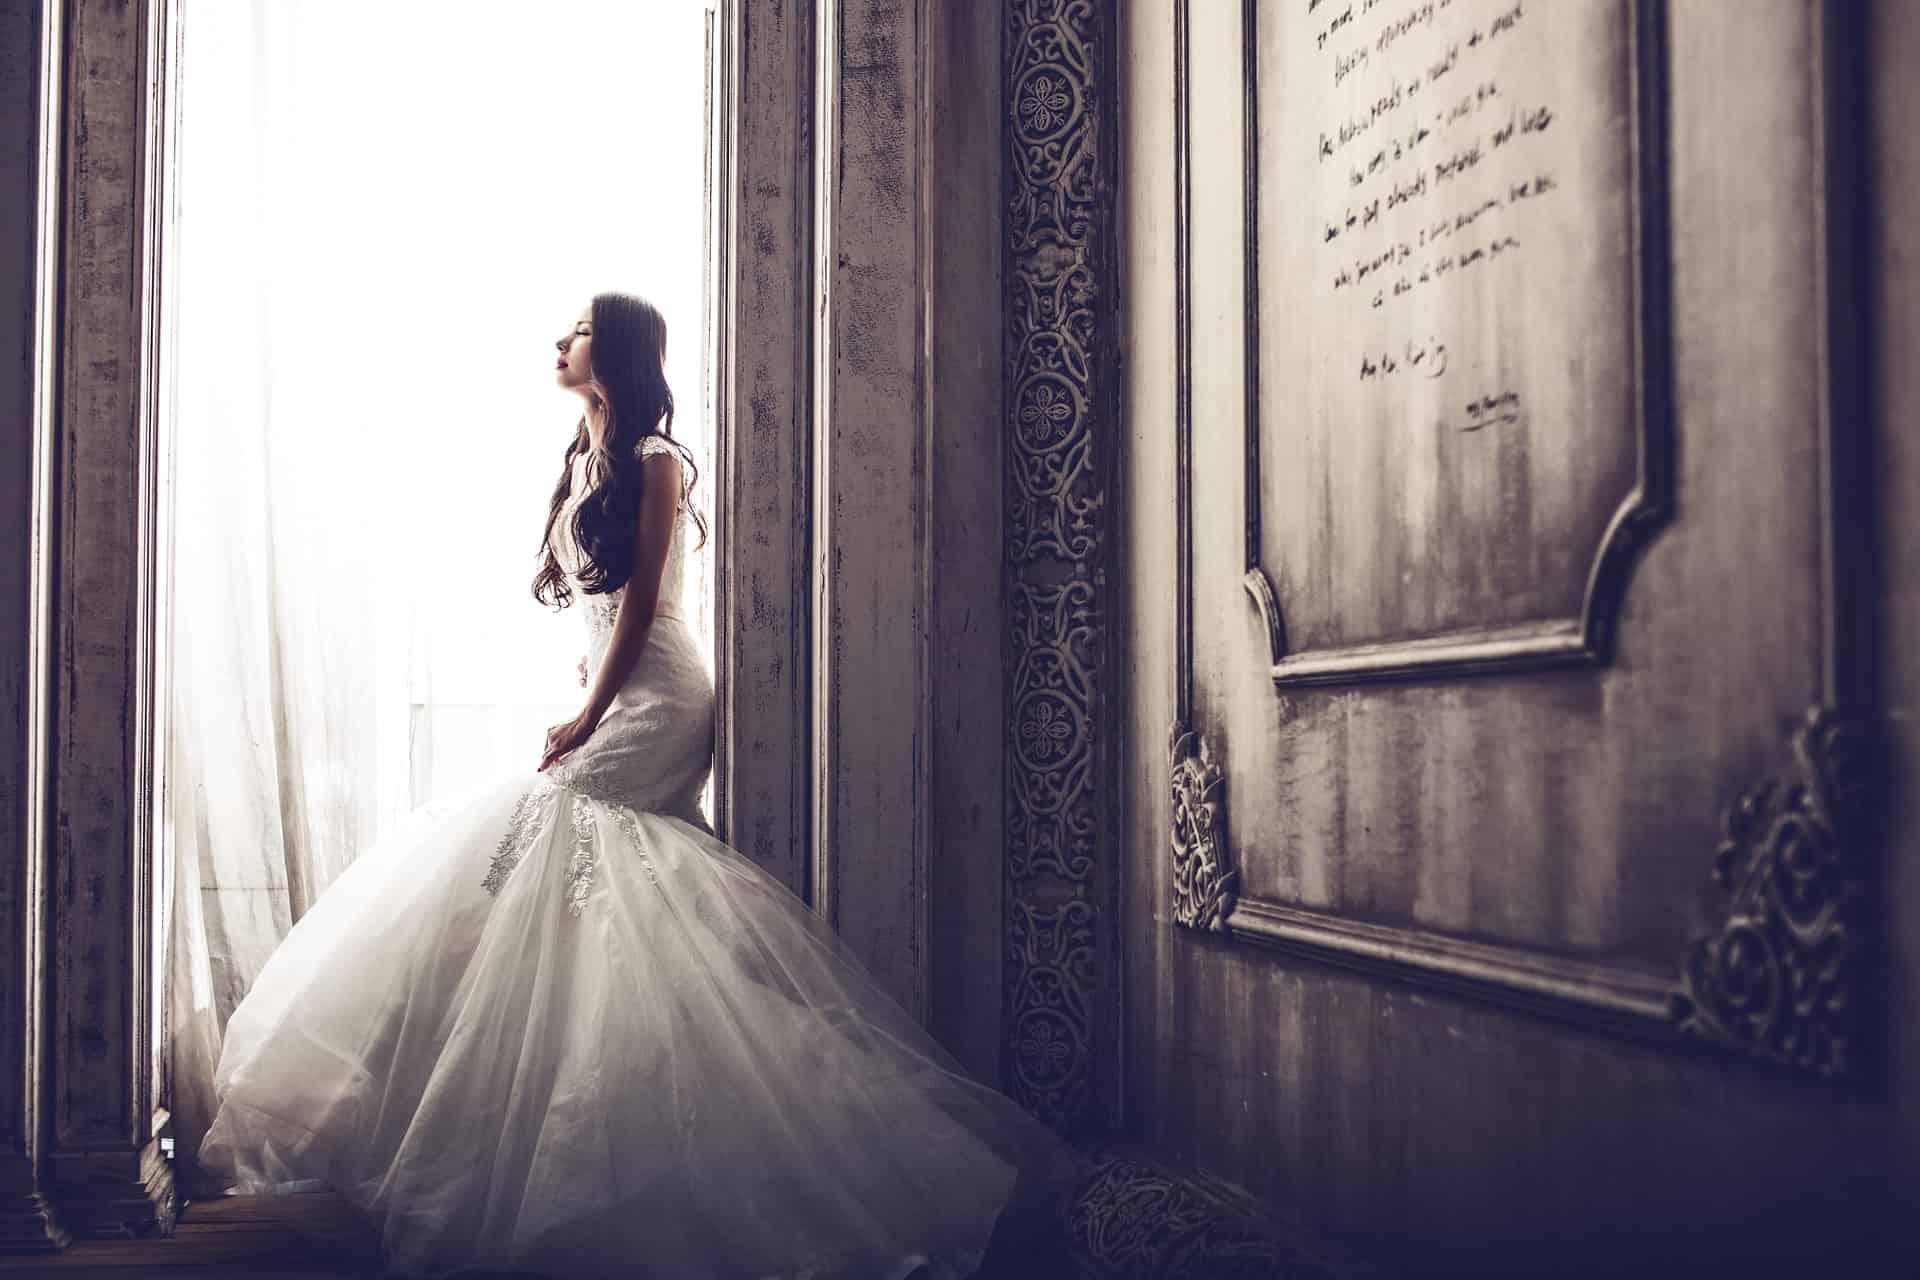 wedding-dresses-1486005_1920-min